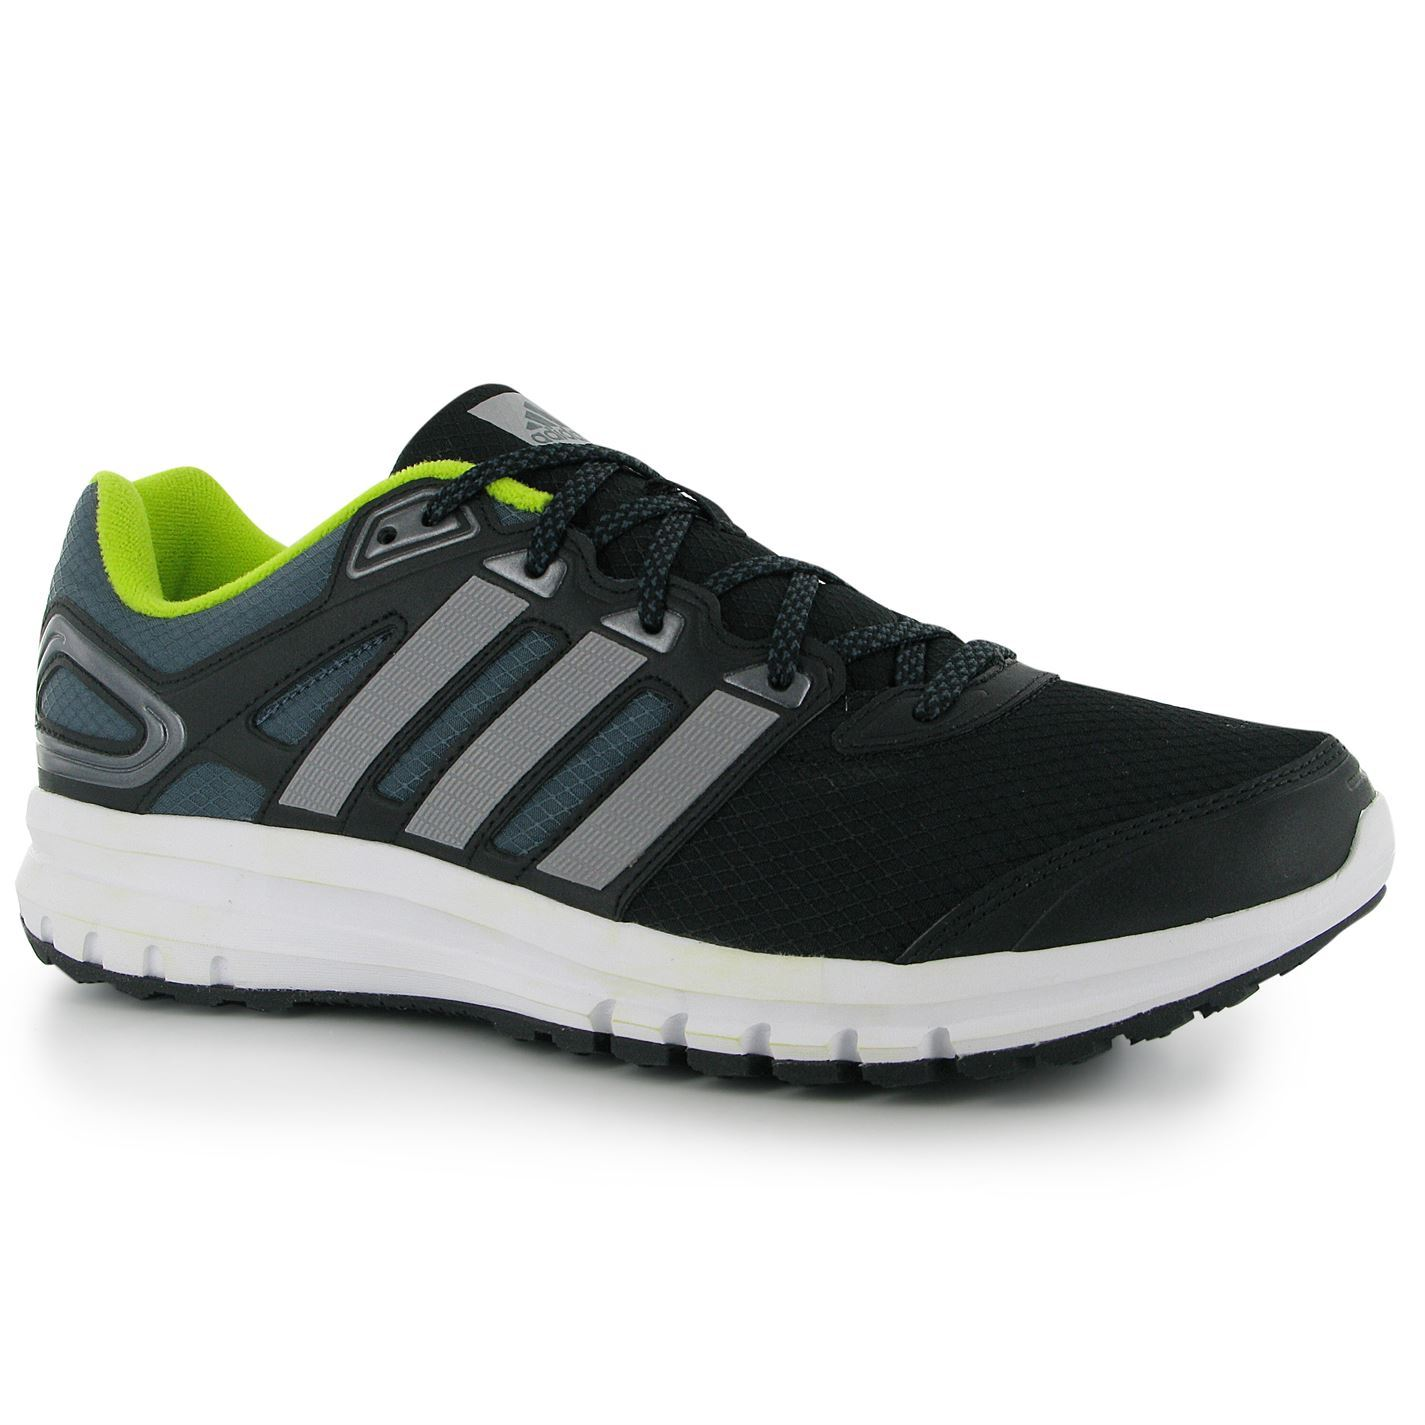 promo code be813 767ea ... Adidas Duramo 6 Mens Trail Running Shoe Trainers Sneakers Footwear  BlkGrySlime ...